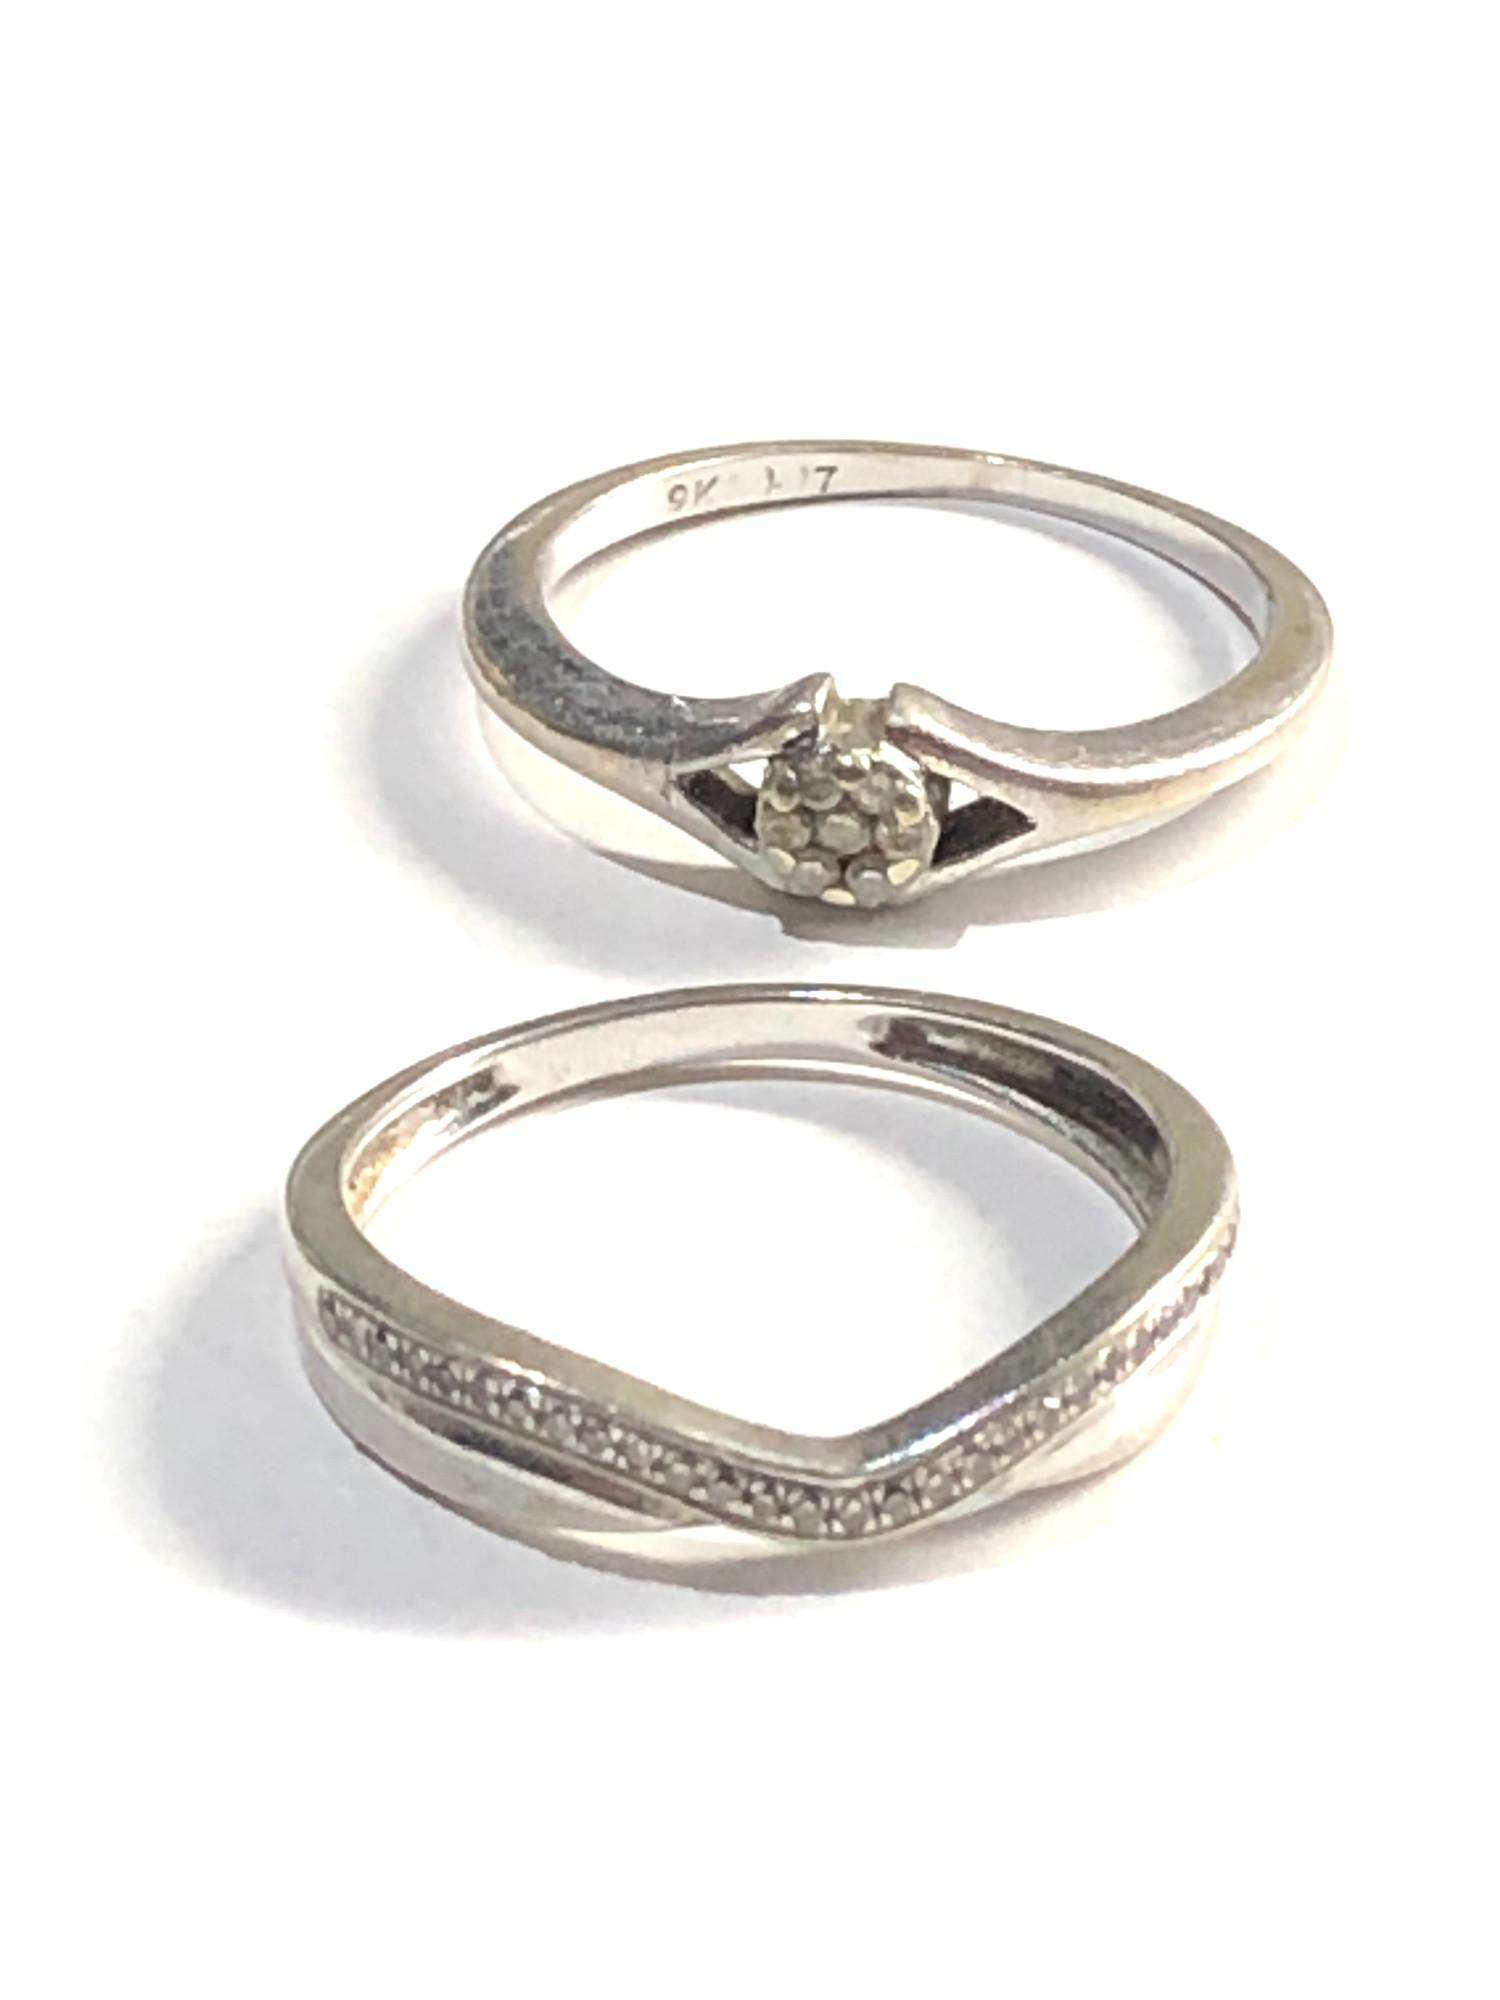 2 x 9ct white gold diamond set rings 3.1g - Image 2 of 3